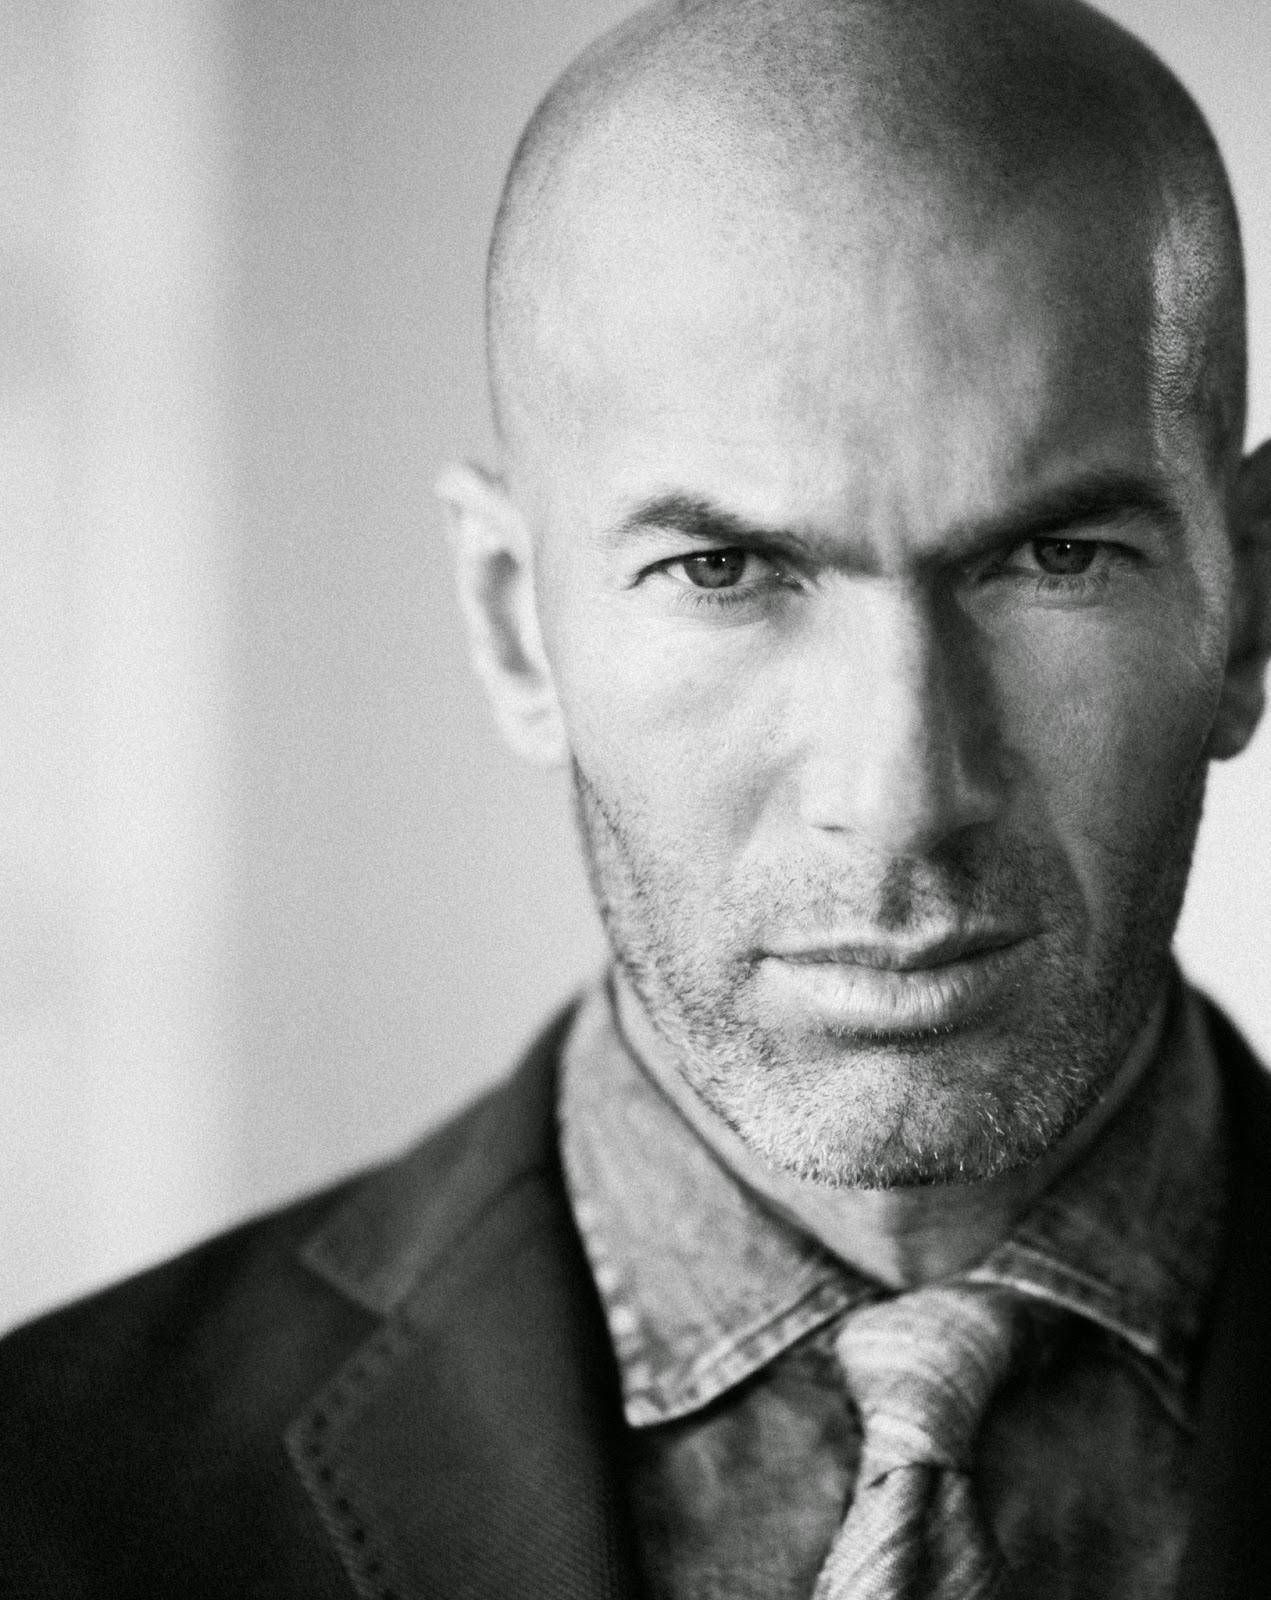 Mango, Man, Zidane, menswear, Spring 2015, zidaneformango, Suits and Shirts, gentleman,